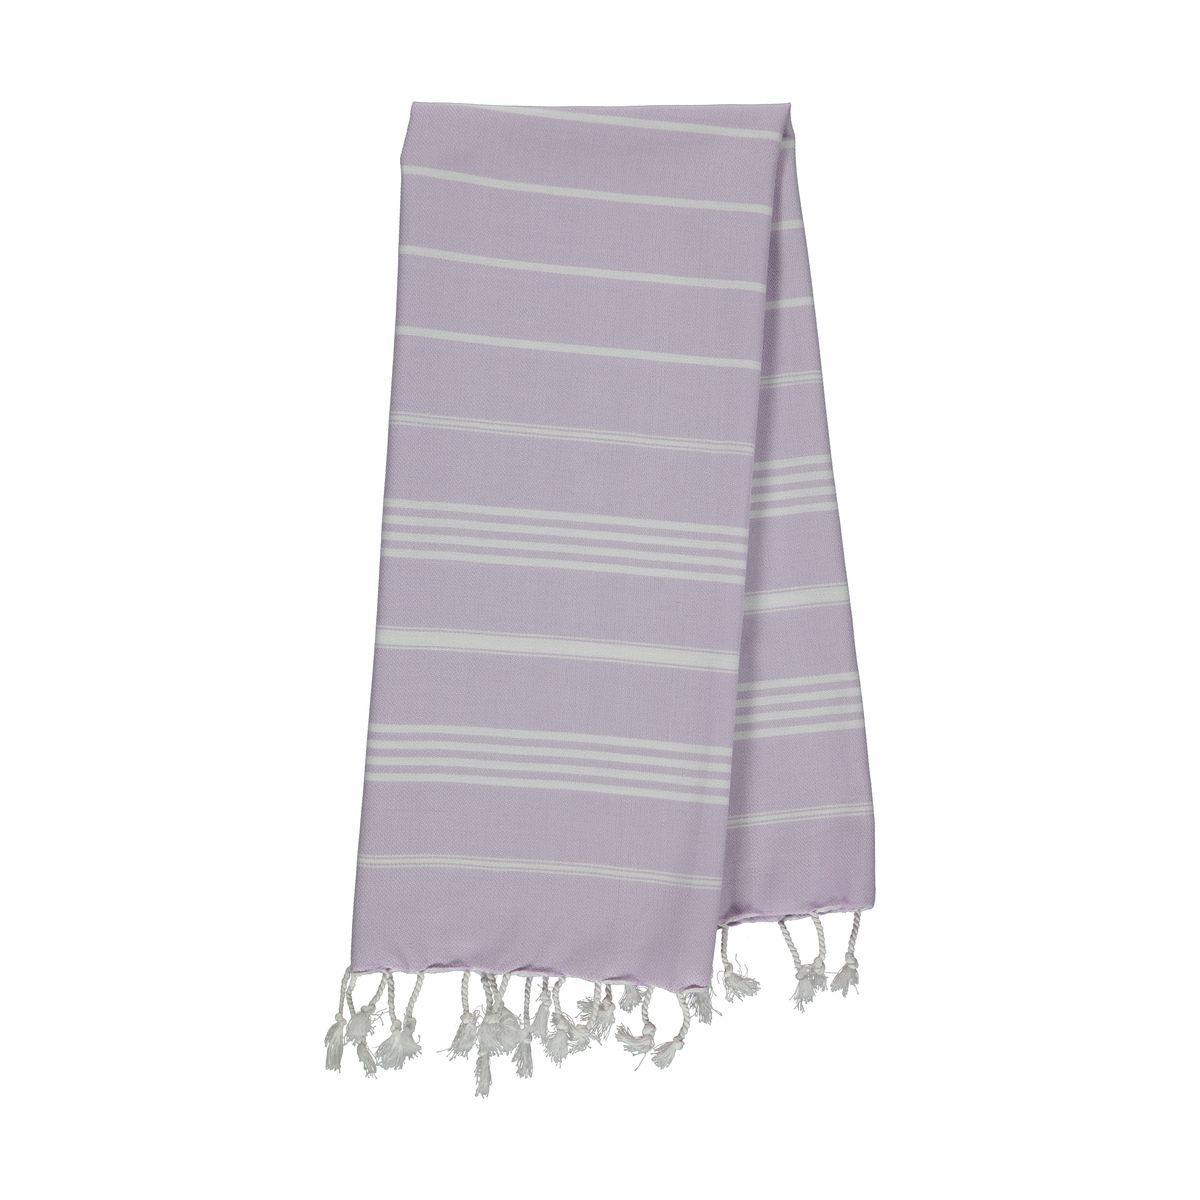 Peskir Leyla / Lilac - Lavender